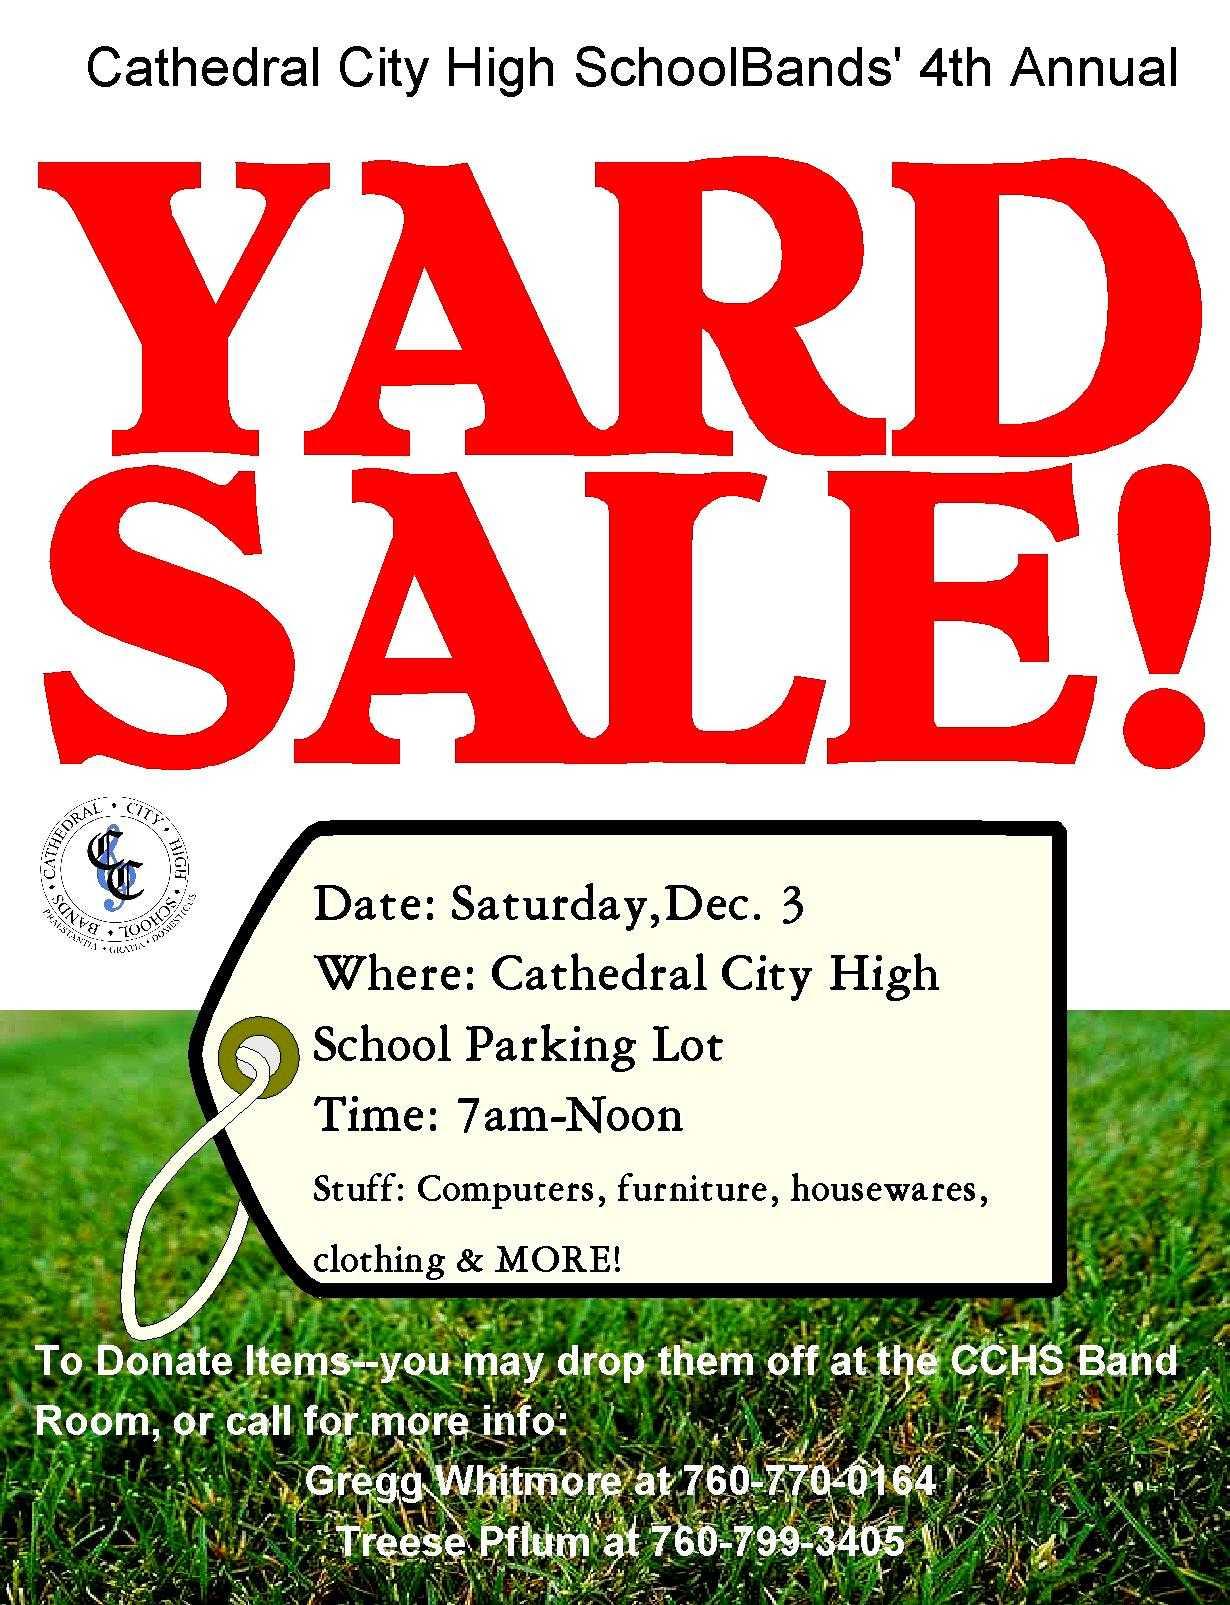 Yard Sale Flyer Template Word - Colona.rsd7 Intended For Free Yard Sale Flyer Template